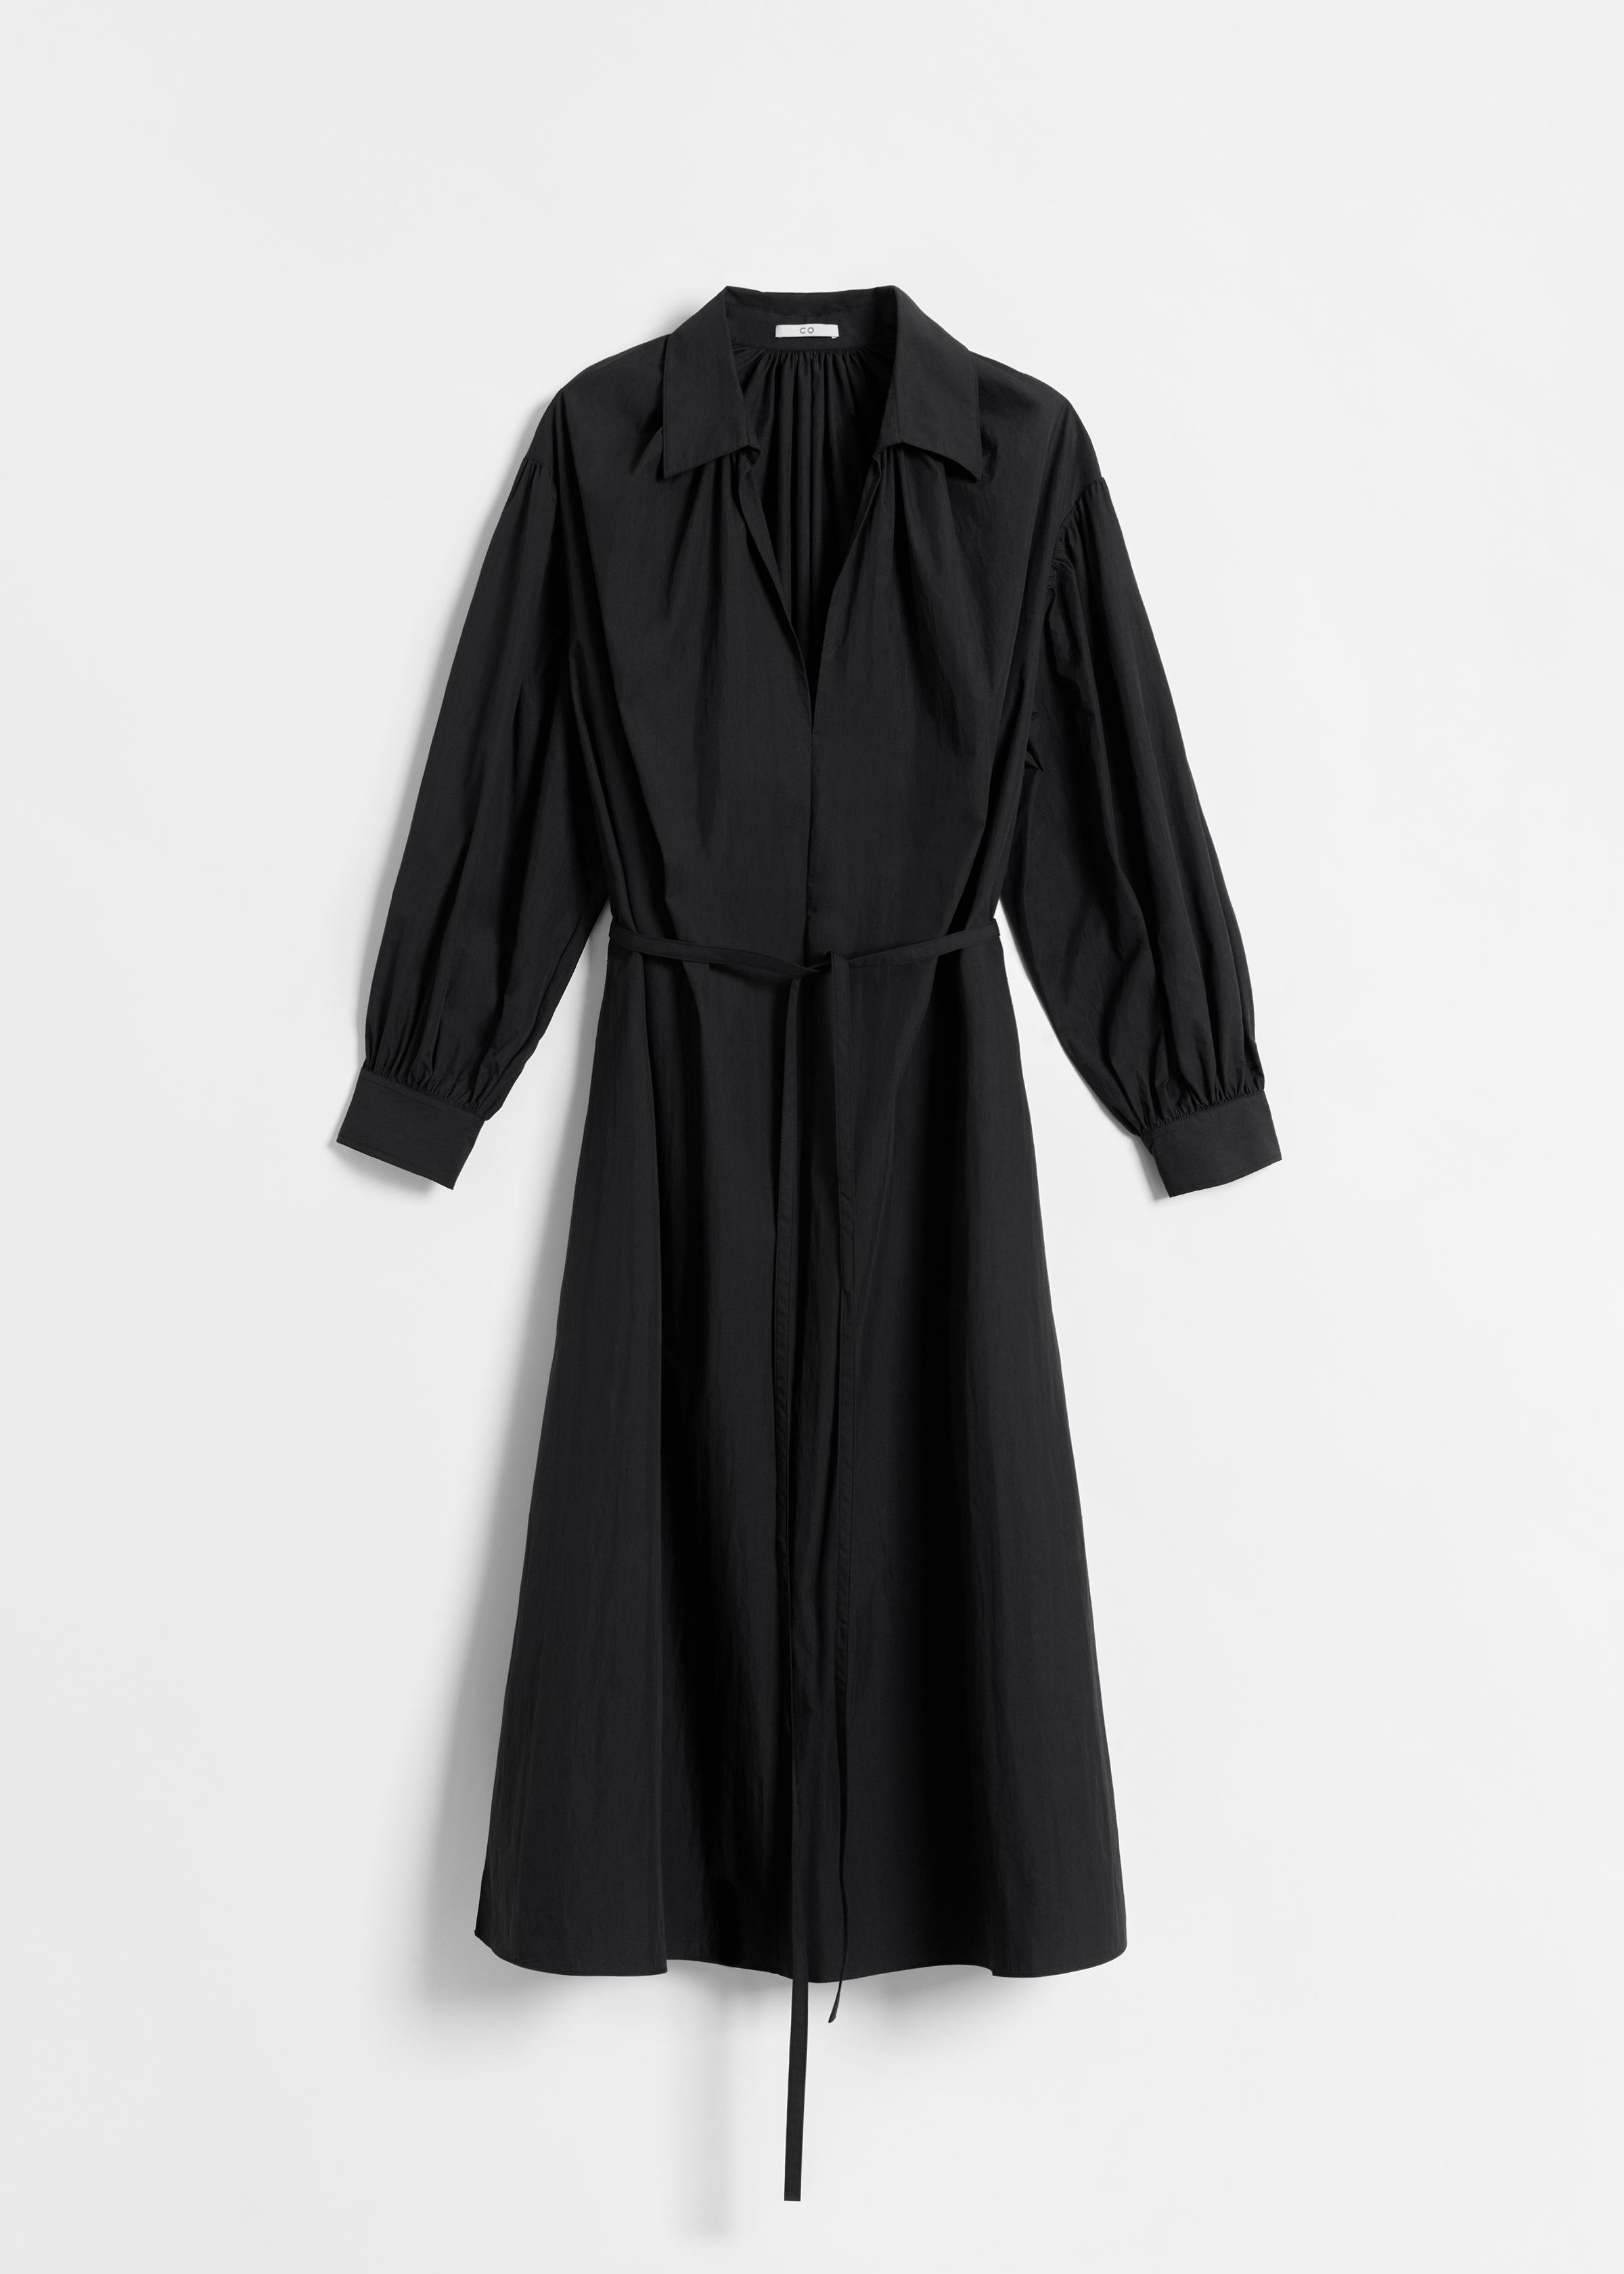 Long Sleeve V Neck Dress in Cotton - Black - CO